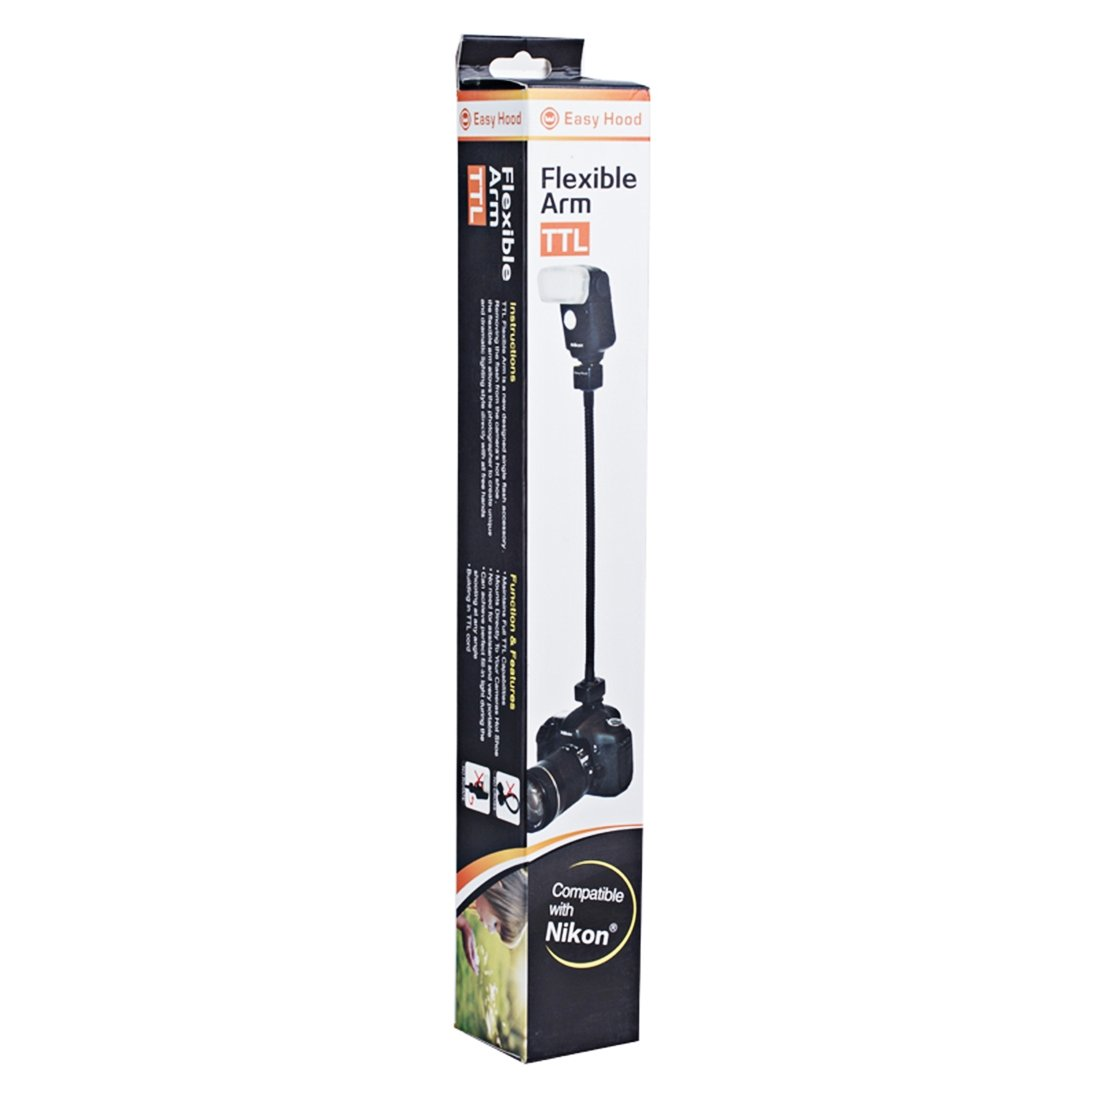 Stand Bracket Stand Bracket Flexible Rotating Arm Flash Light TTL Bracket Hand Grip Holder Mount for Nikon